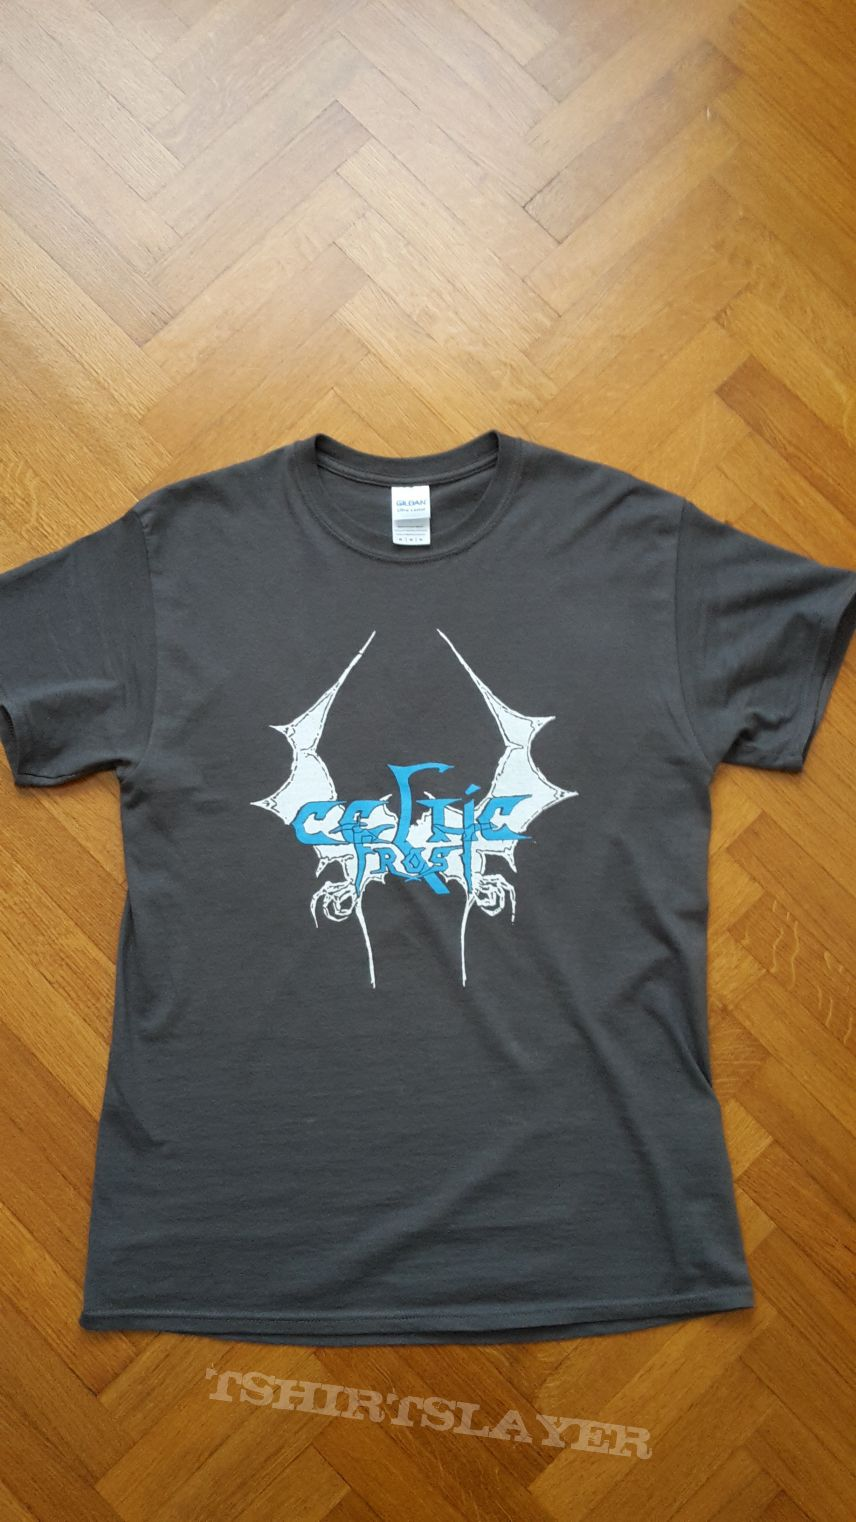 Celtic Frost winged logo